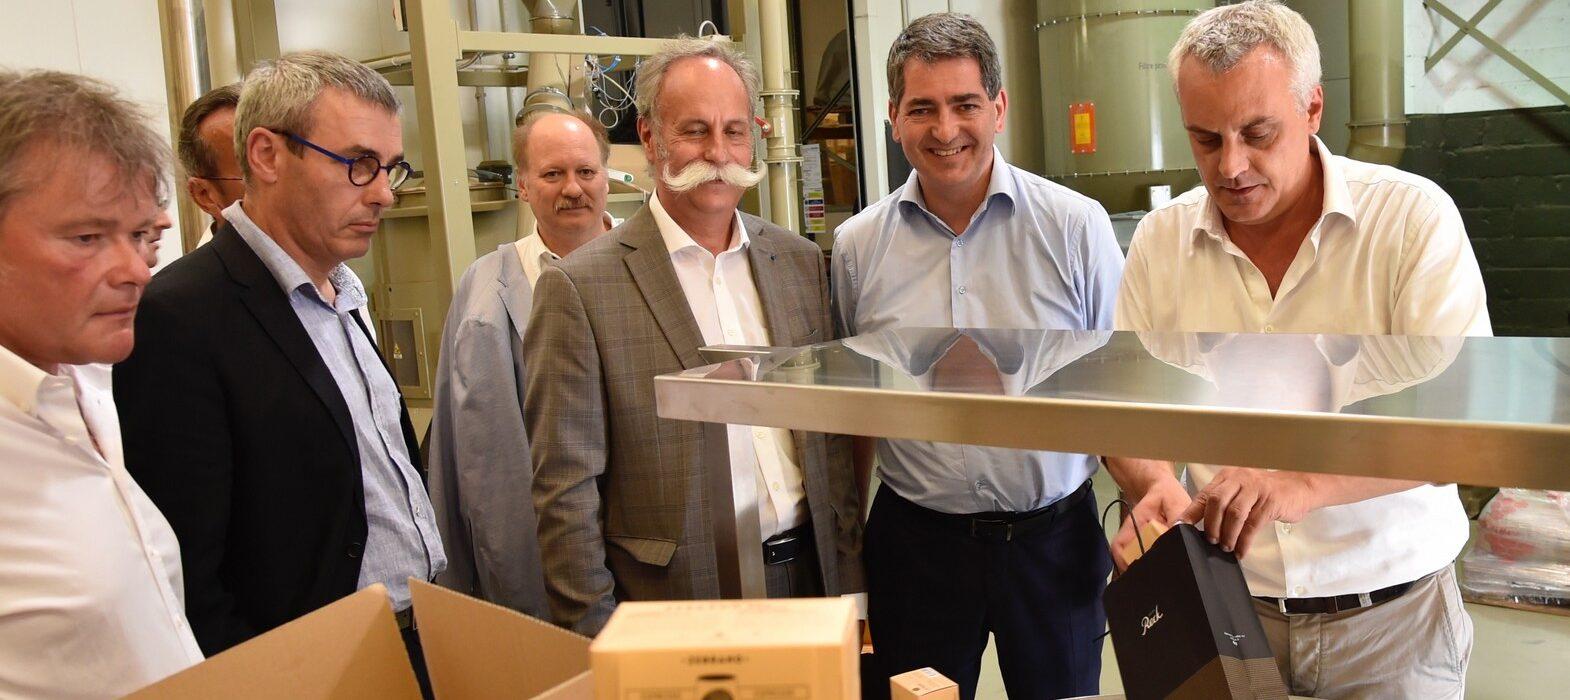 Signature convention cadre artisanat à Strasbourg cafés Reck